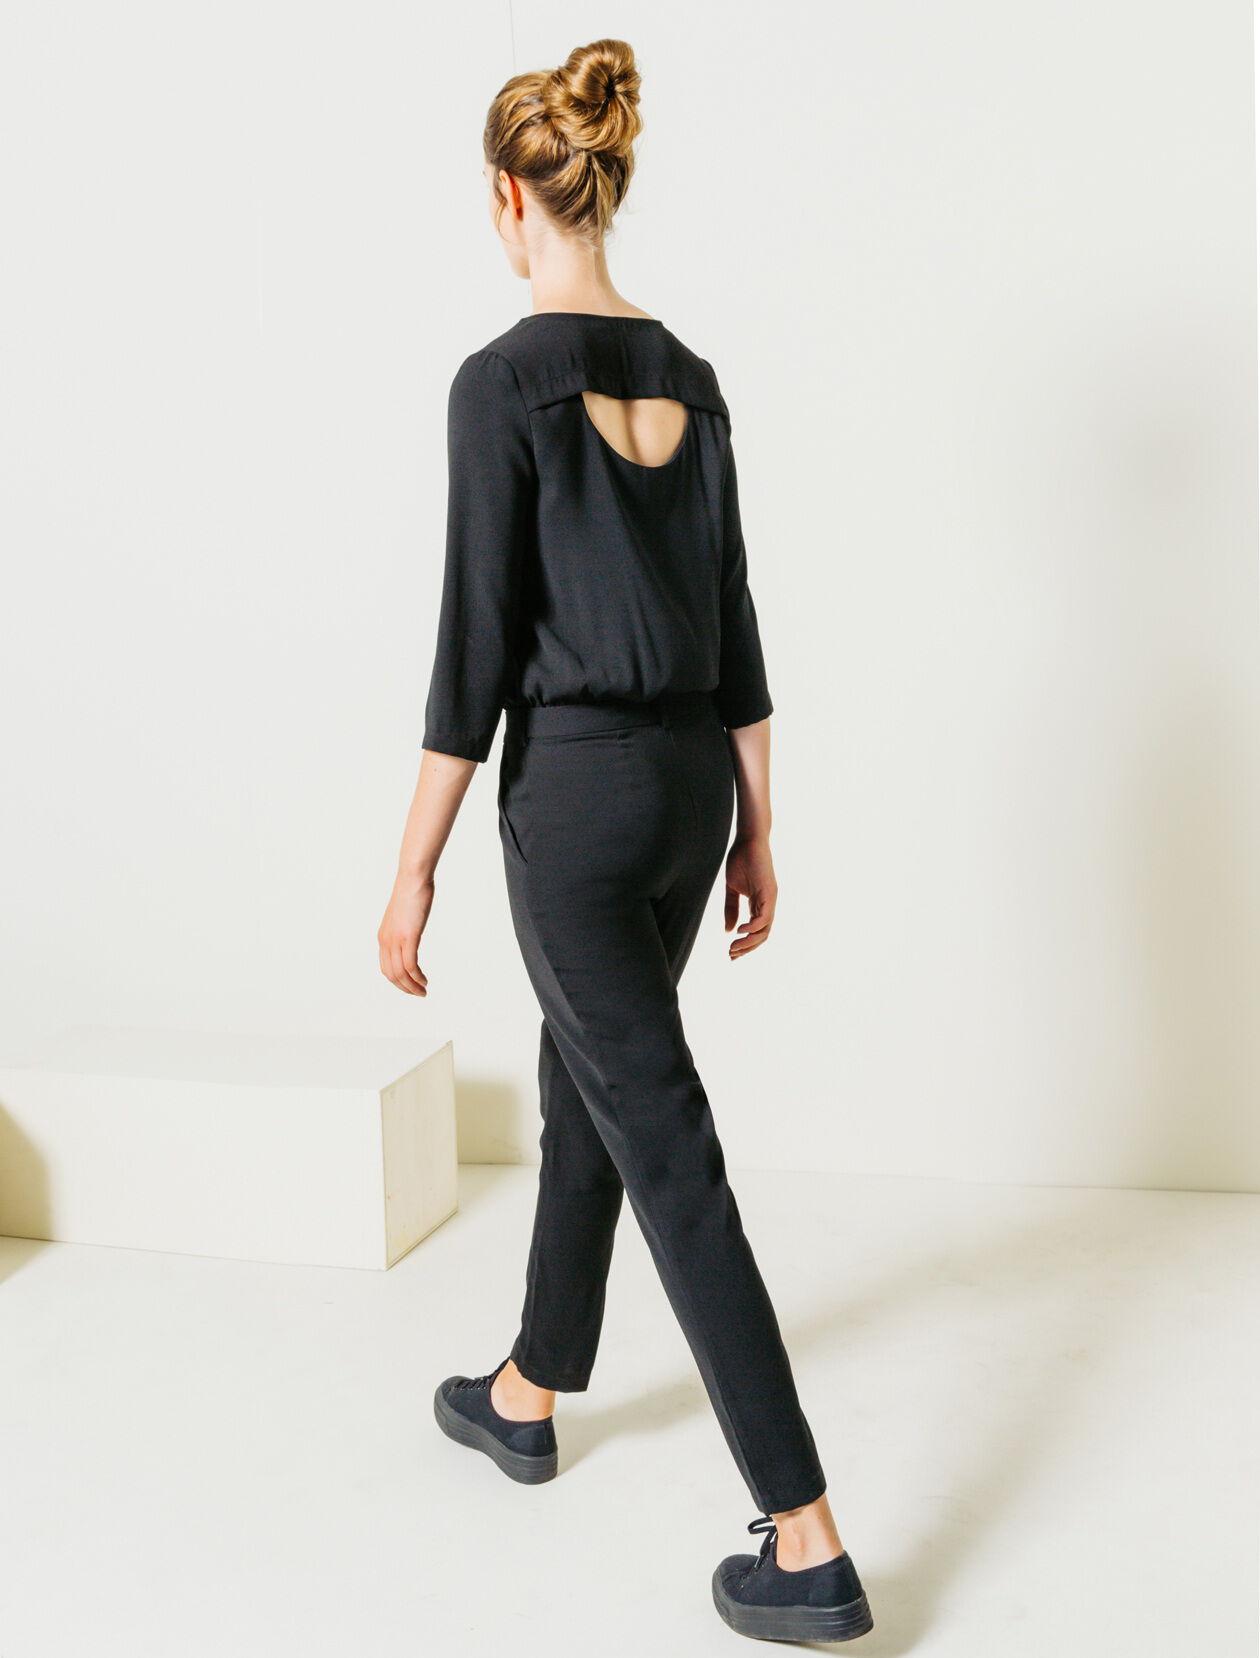 Combinaison Femme Combi Bizzbee Pantalon Short zOzUqrnw